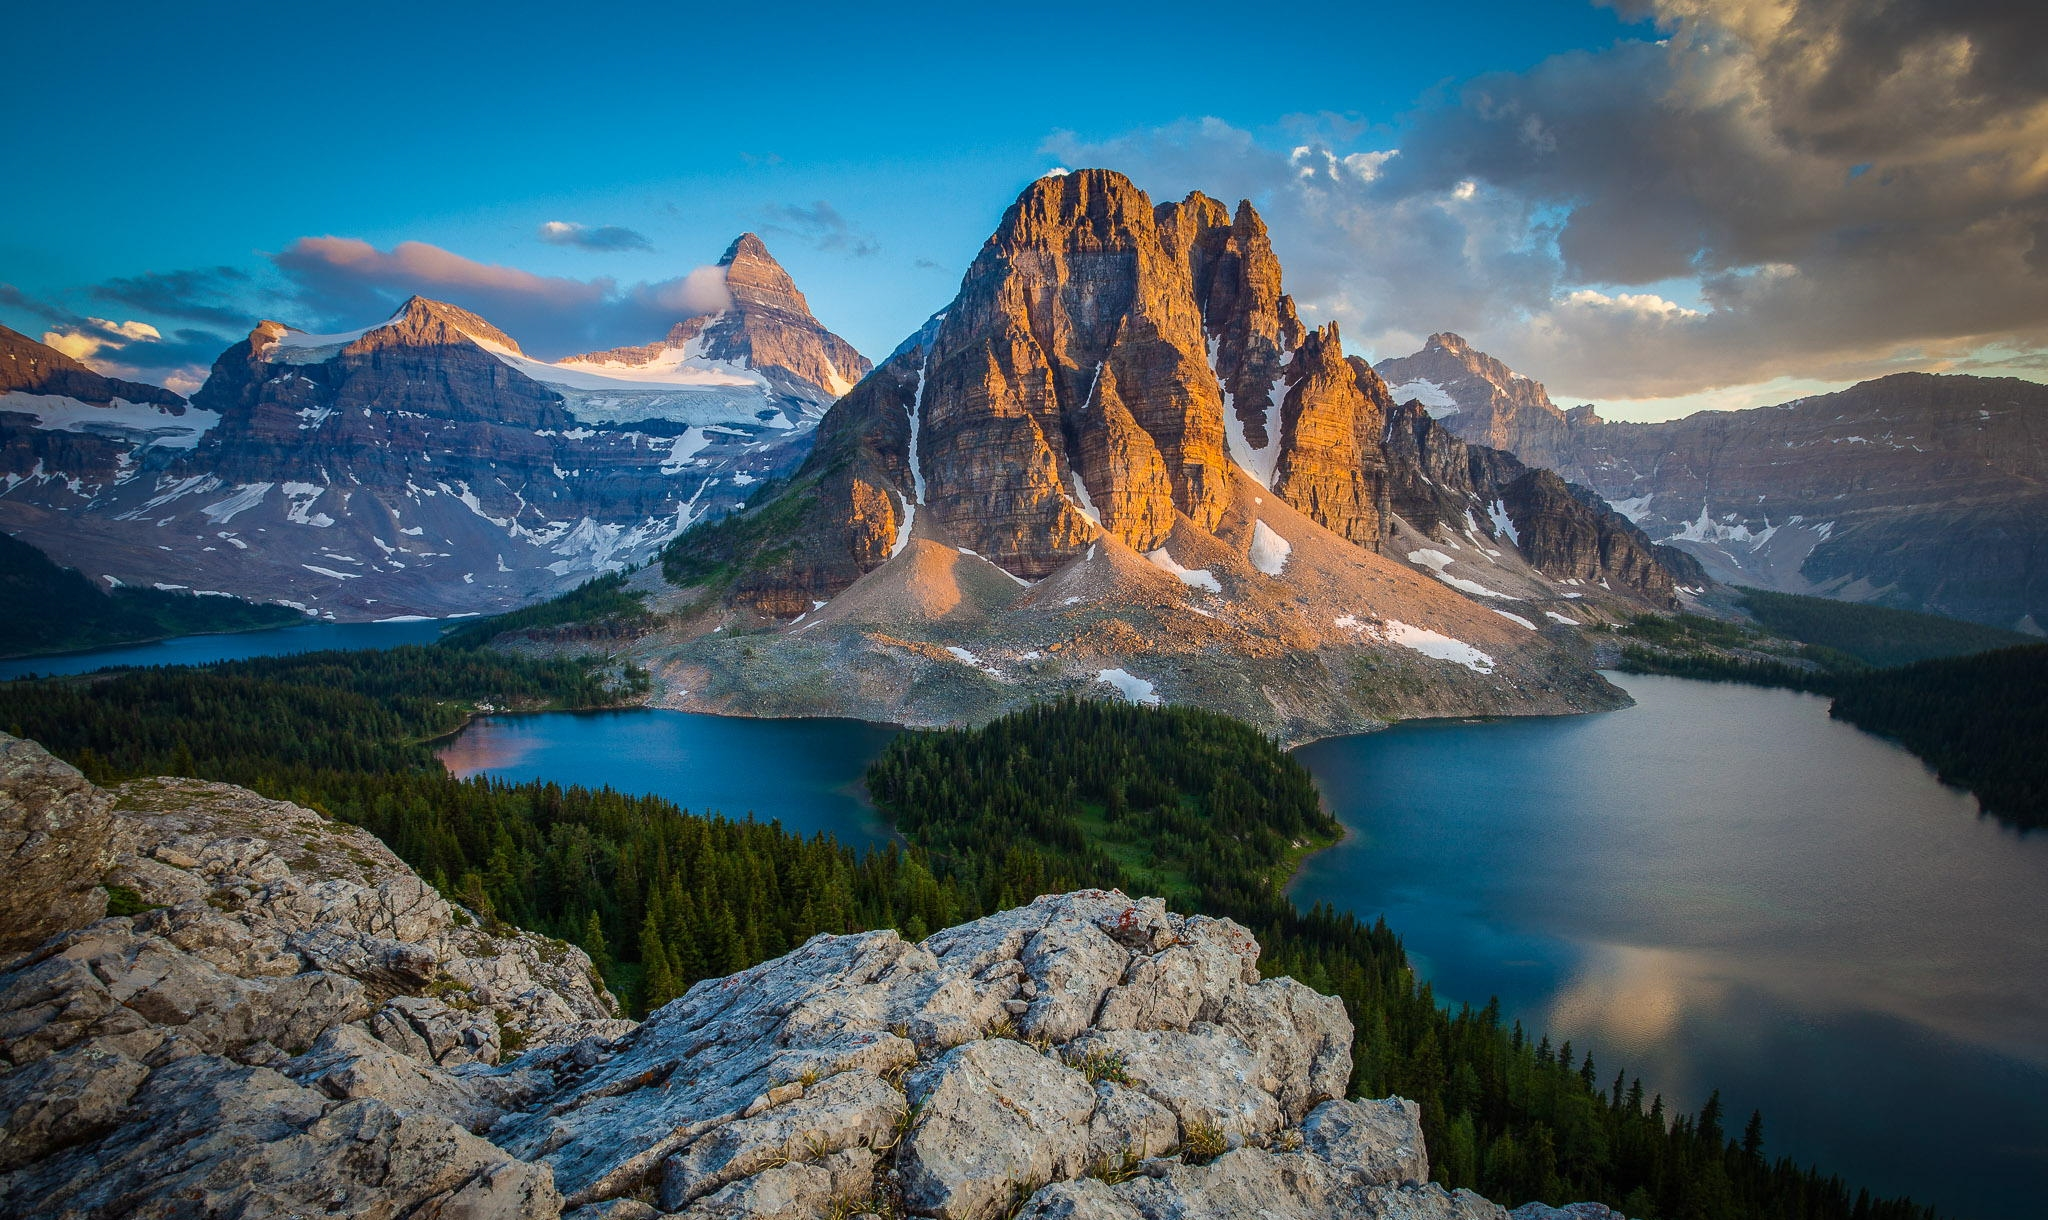 windows 10 hd wallpapers 1080p free download,mountain,mountainous landforms,natural landscape,nature,mountain range